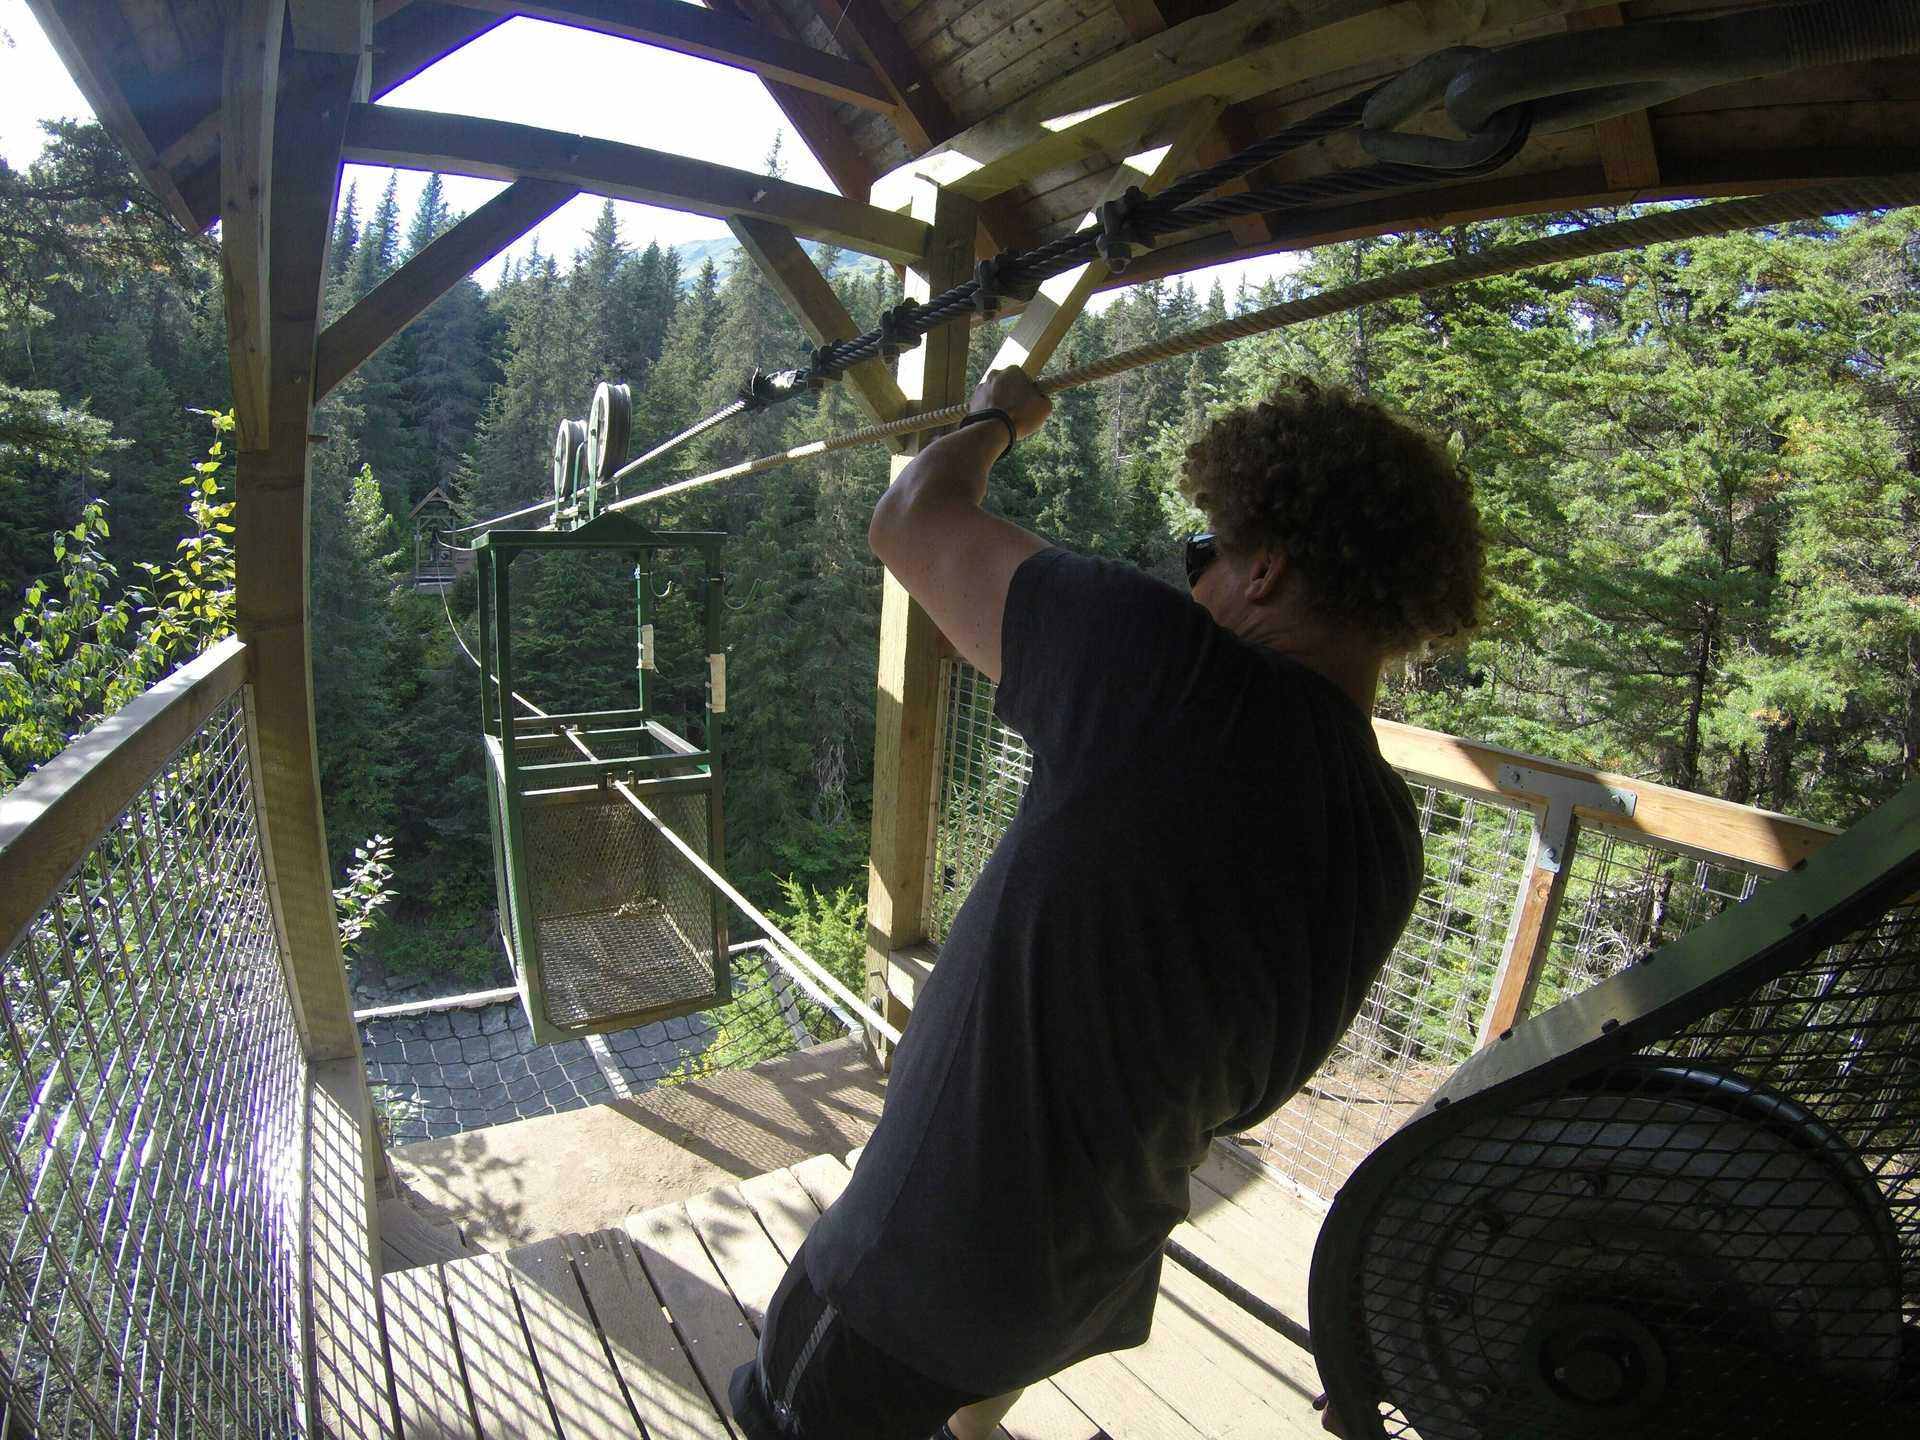 Girdwood Alaska | elise81, adult, daytime, outdoors